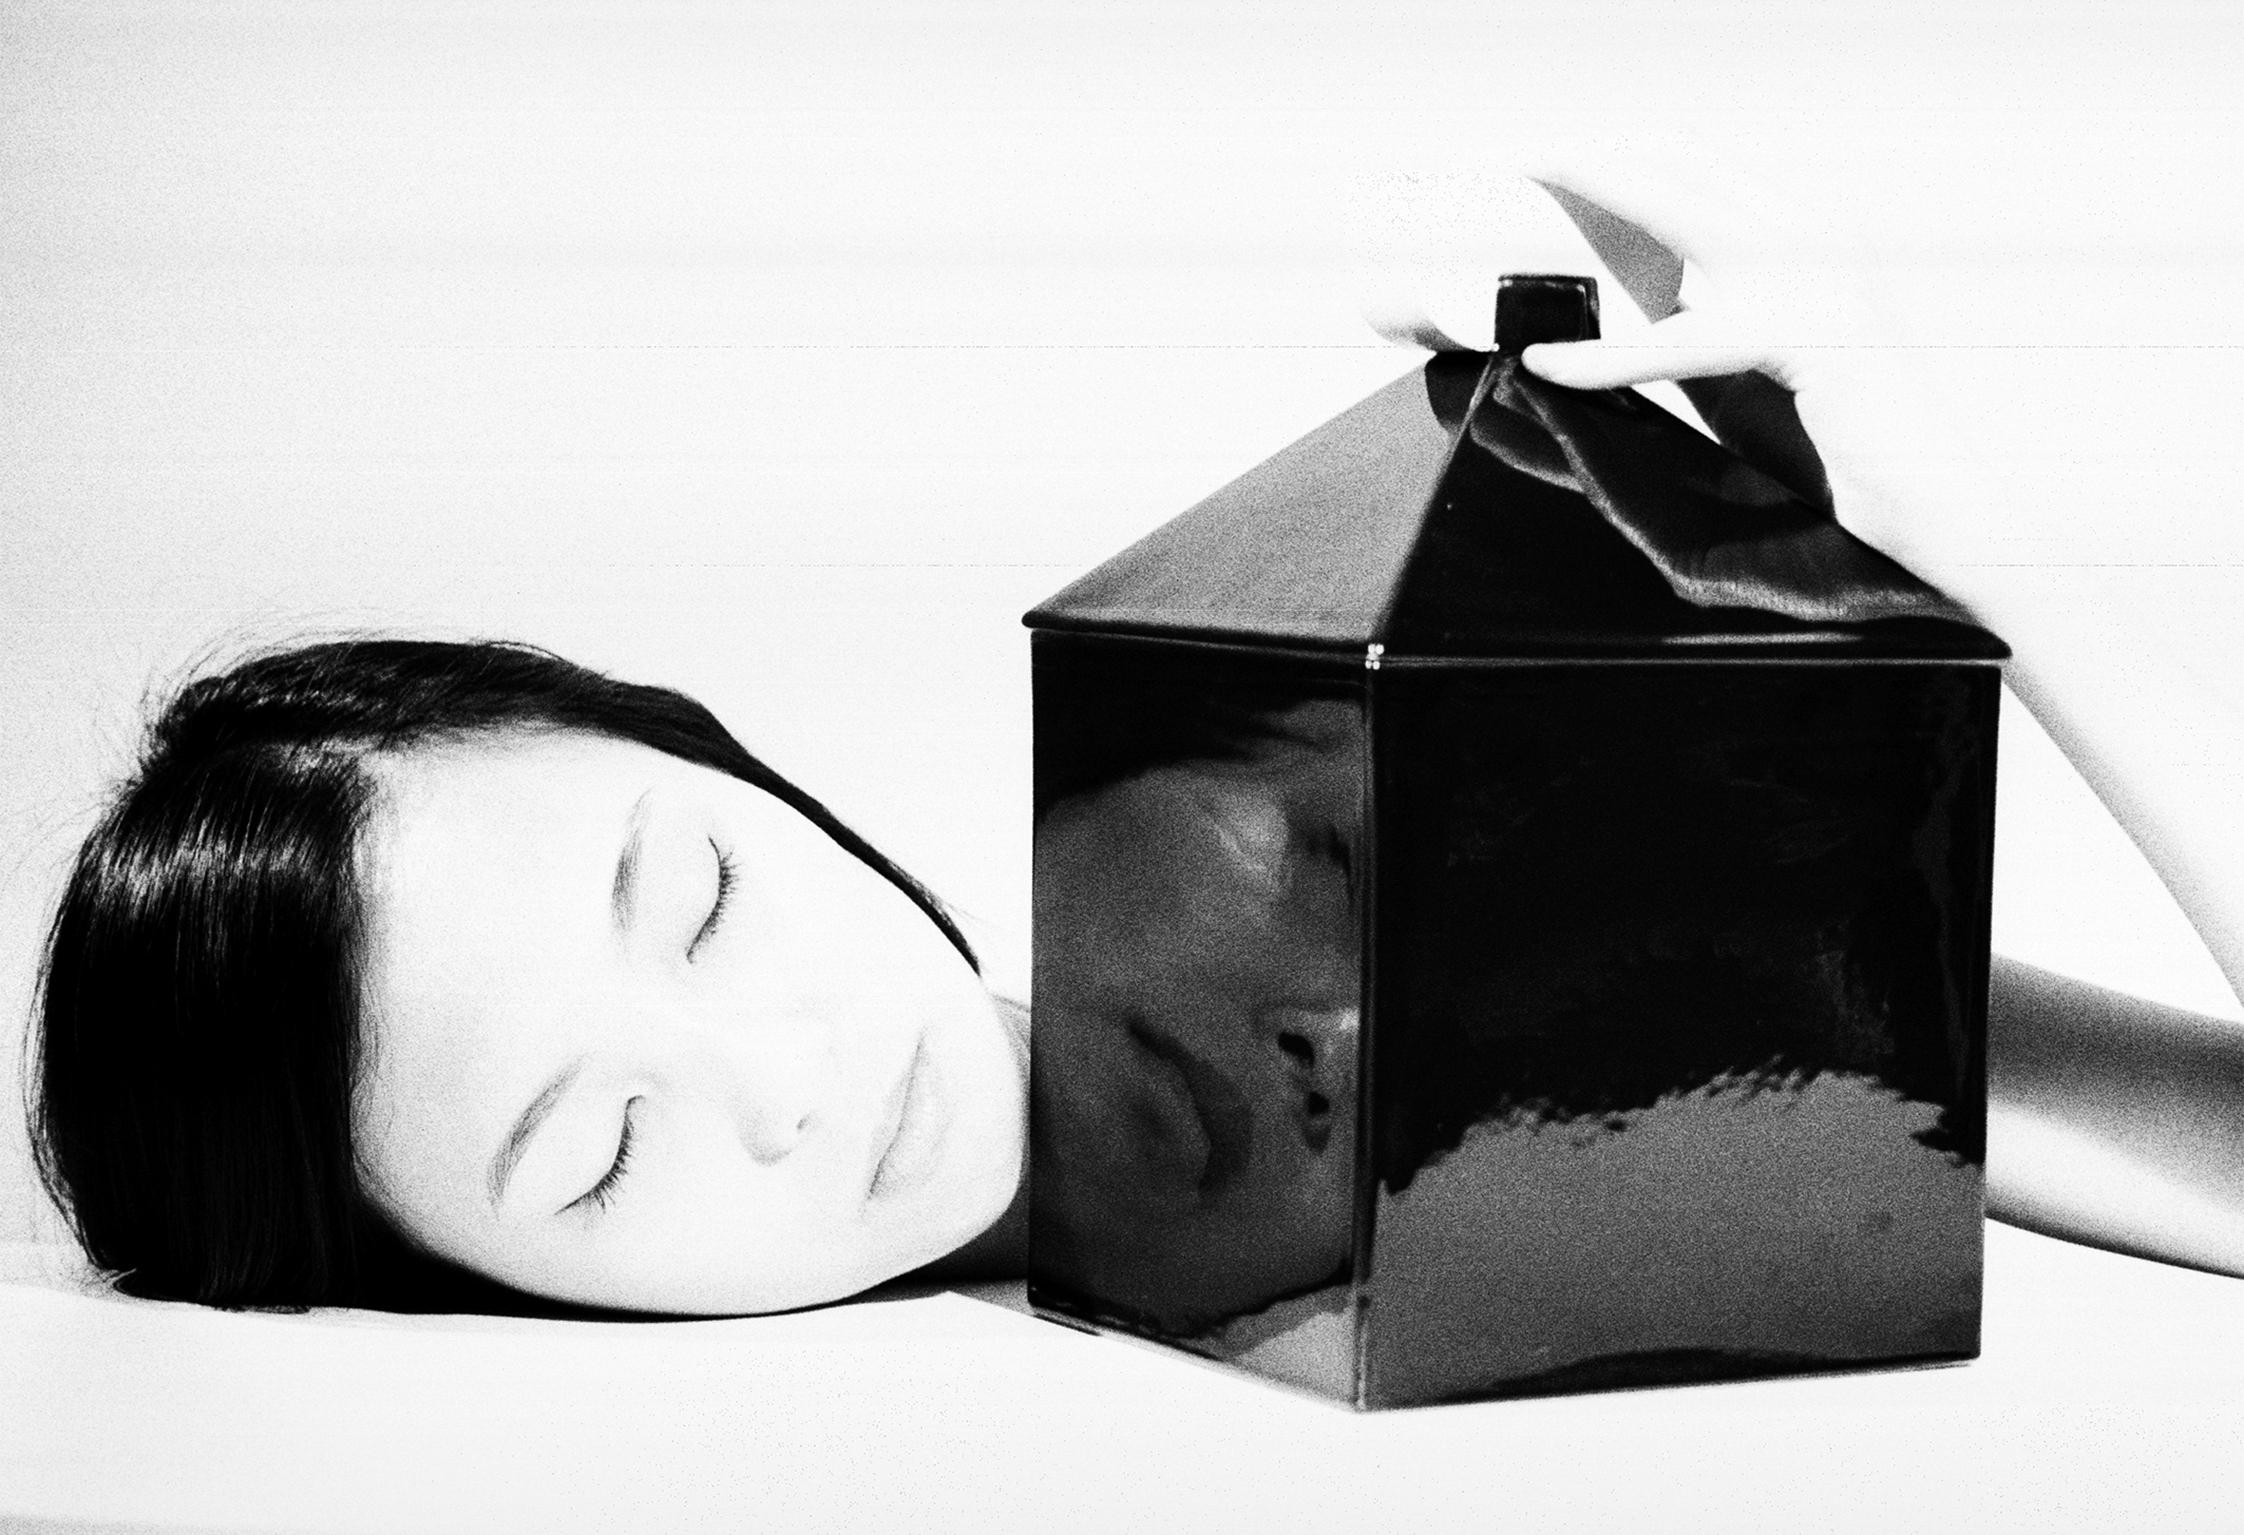 LA CASA NUOVA - Markandré Fotografia Analogica per Demo Ceramics, 2016 Model Barbara Xu